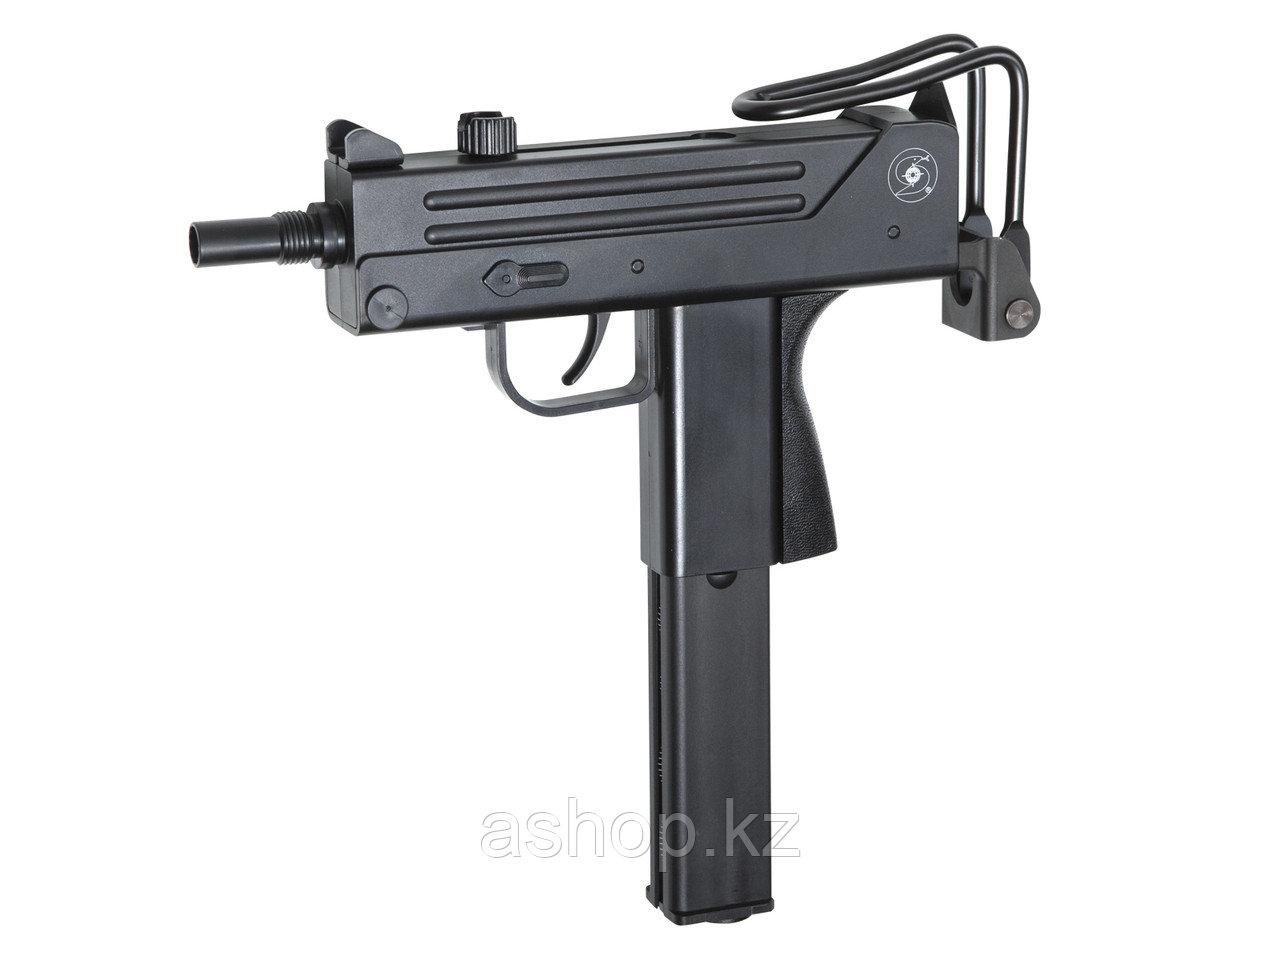 Пистолет-пулемёт пневматический ASG Ingram M11, Калибр: 4,5 мм (.177, BB), Дульная энергия: 2,5 Дж, Ёмкость ма